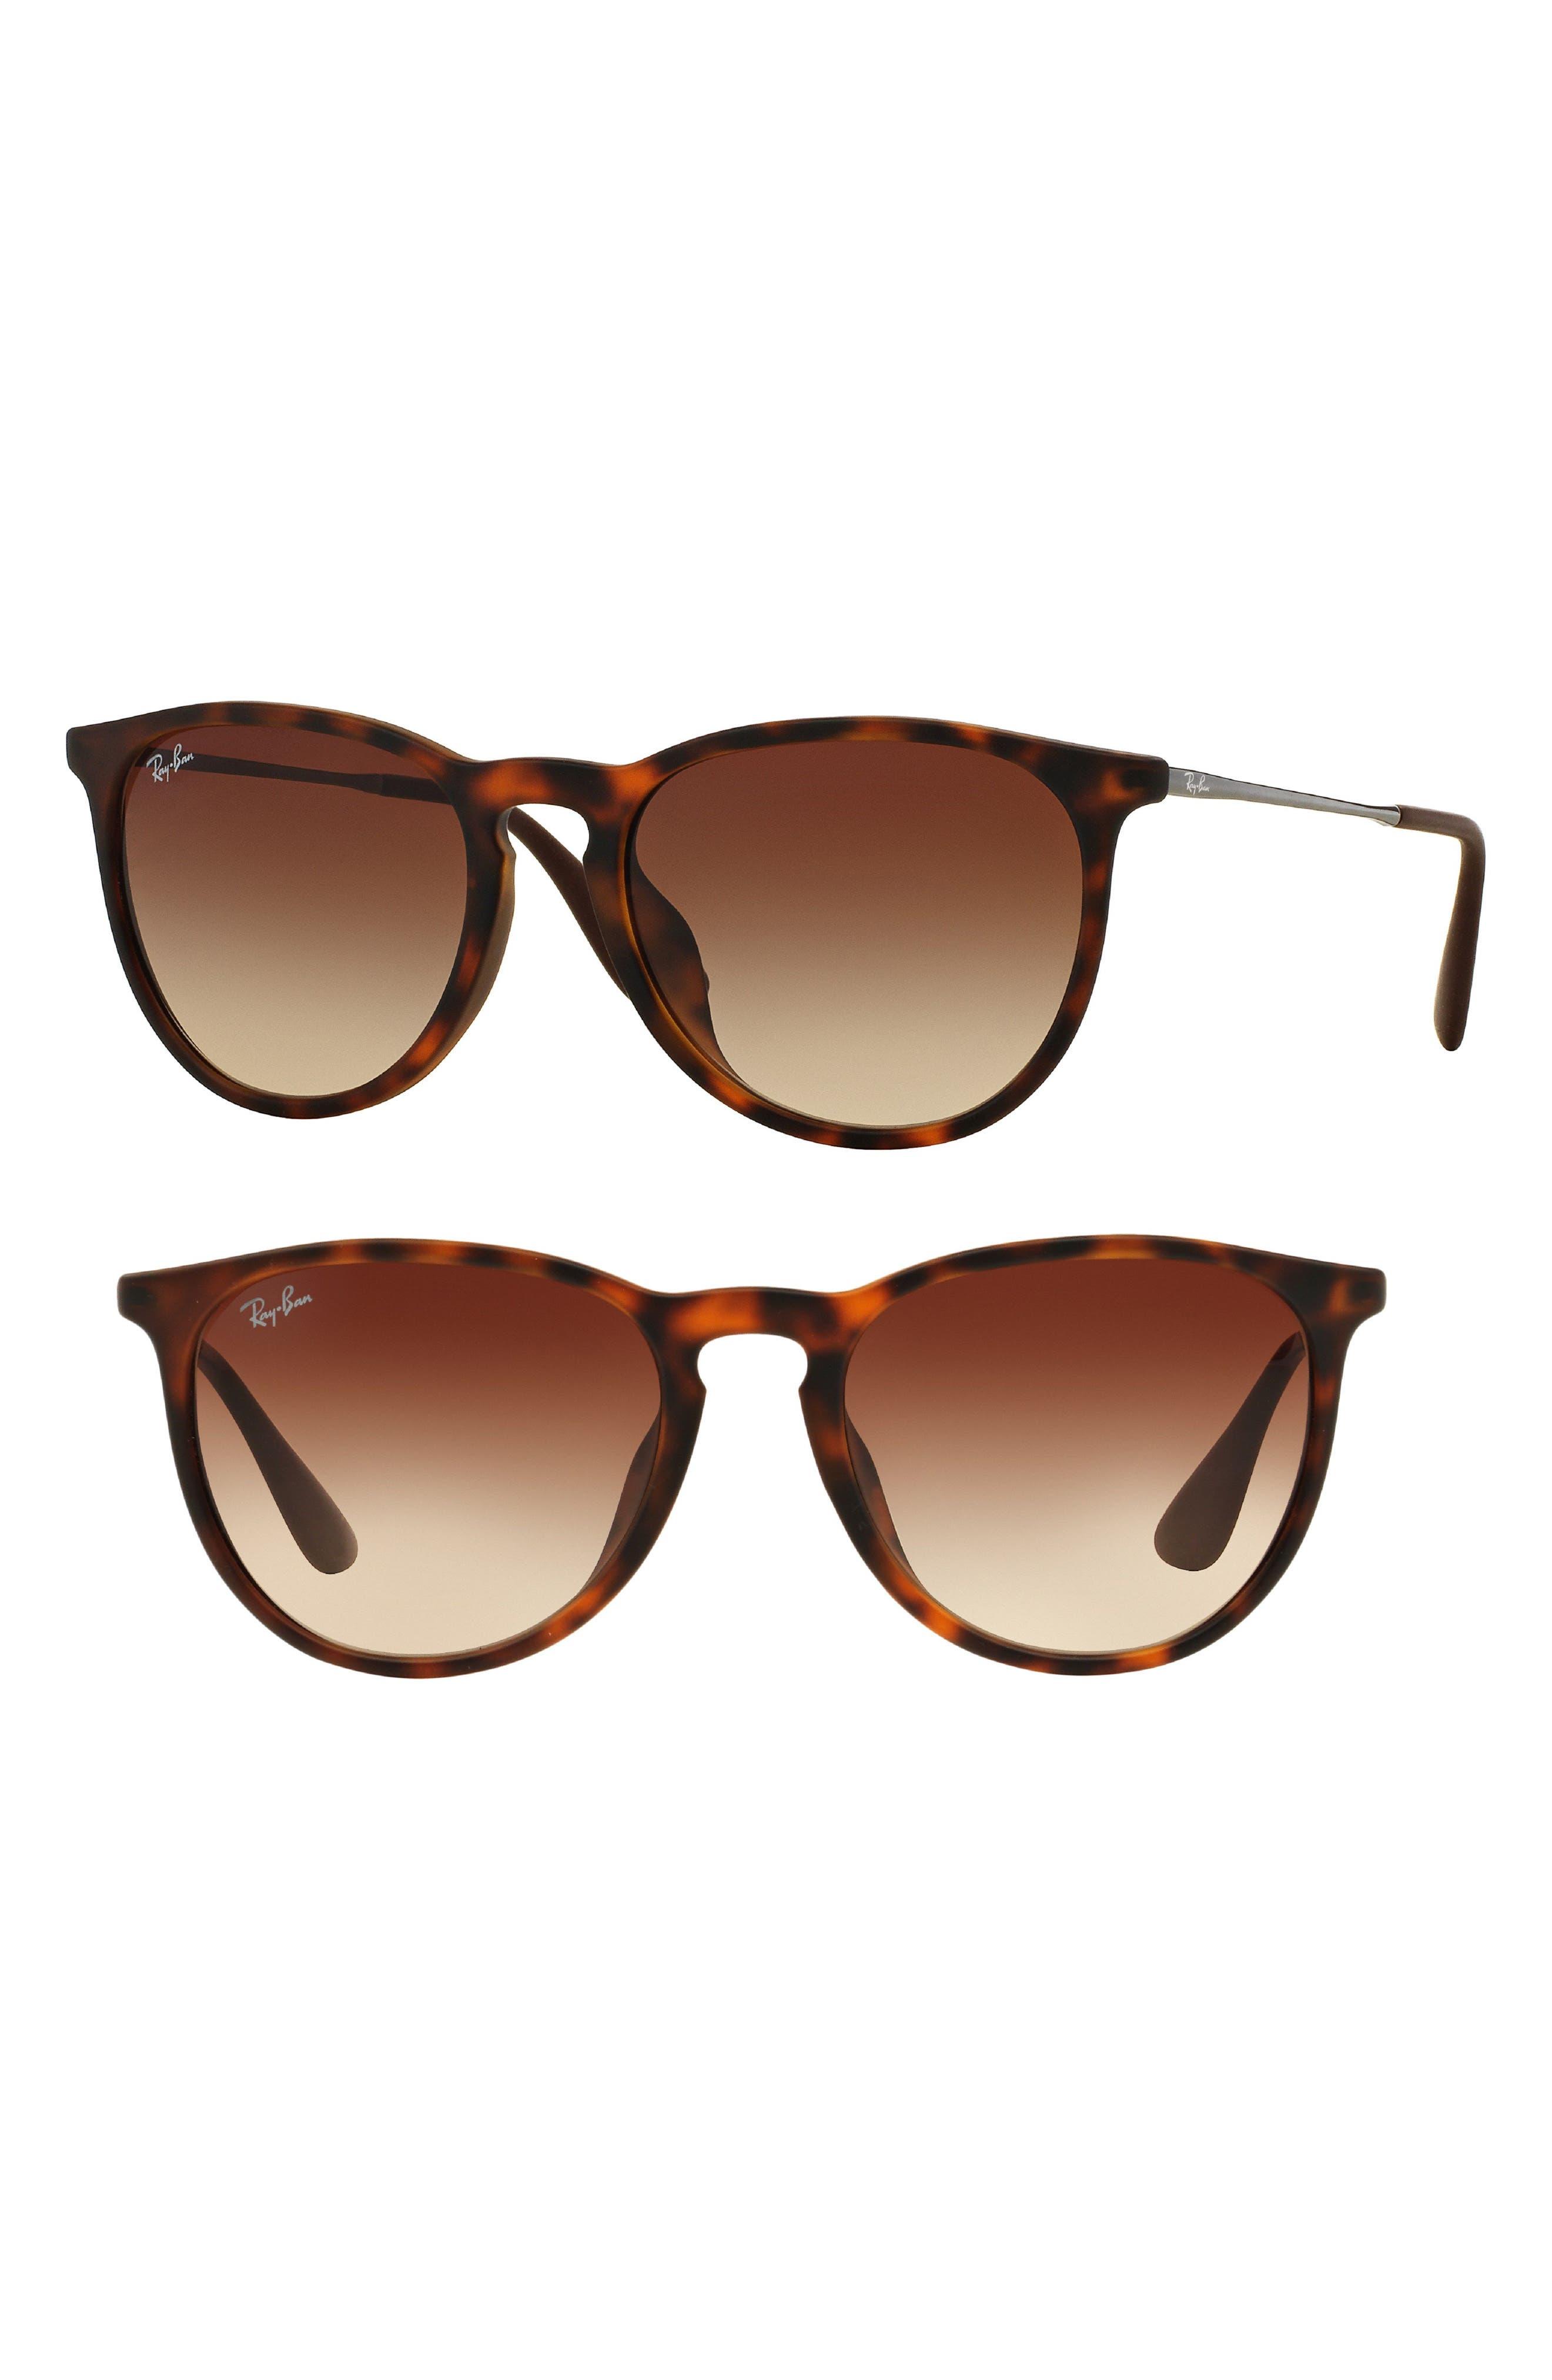 Erika 54mm Sunglasses,                             Main thumbnail 1, color,                             Tortoise/ Silver